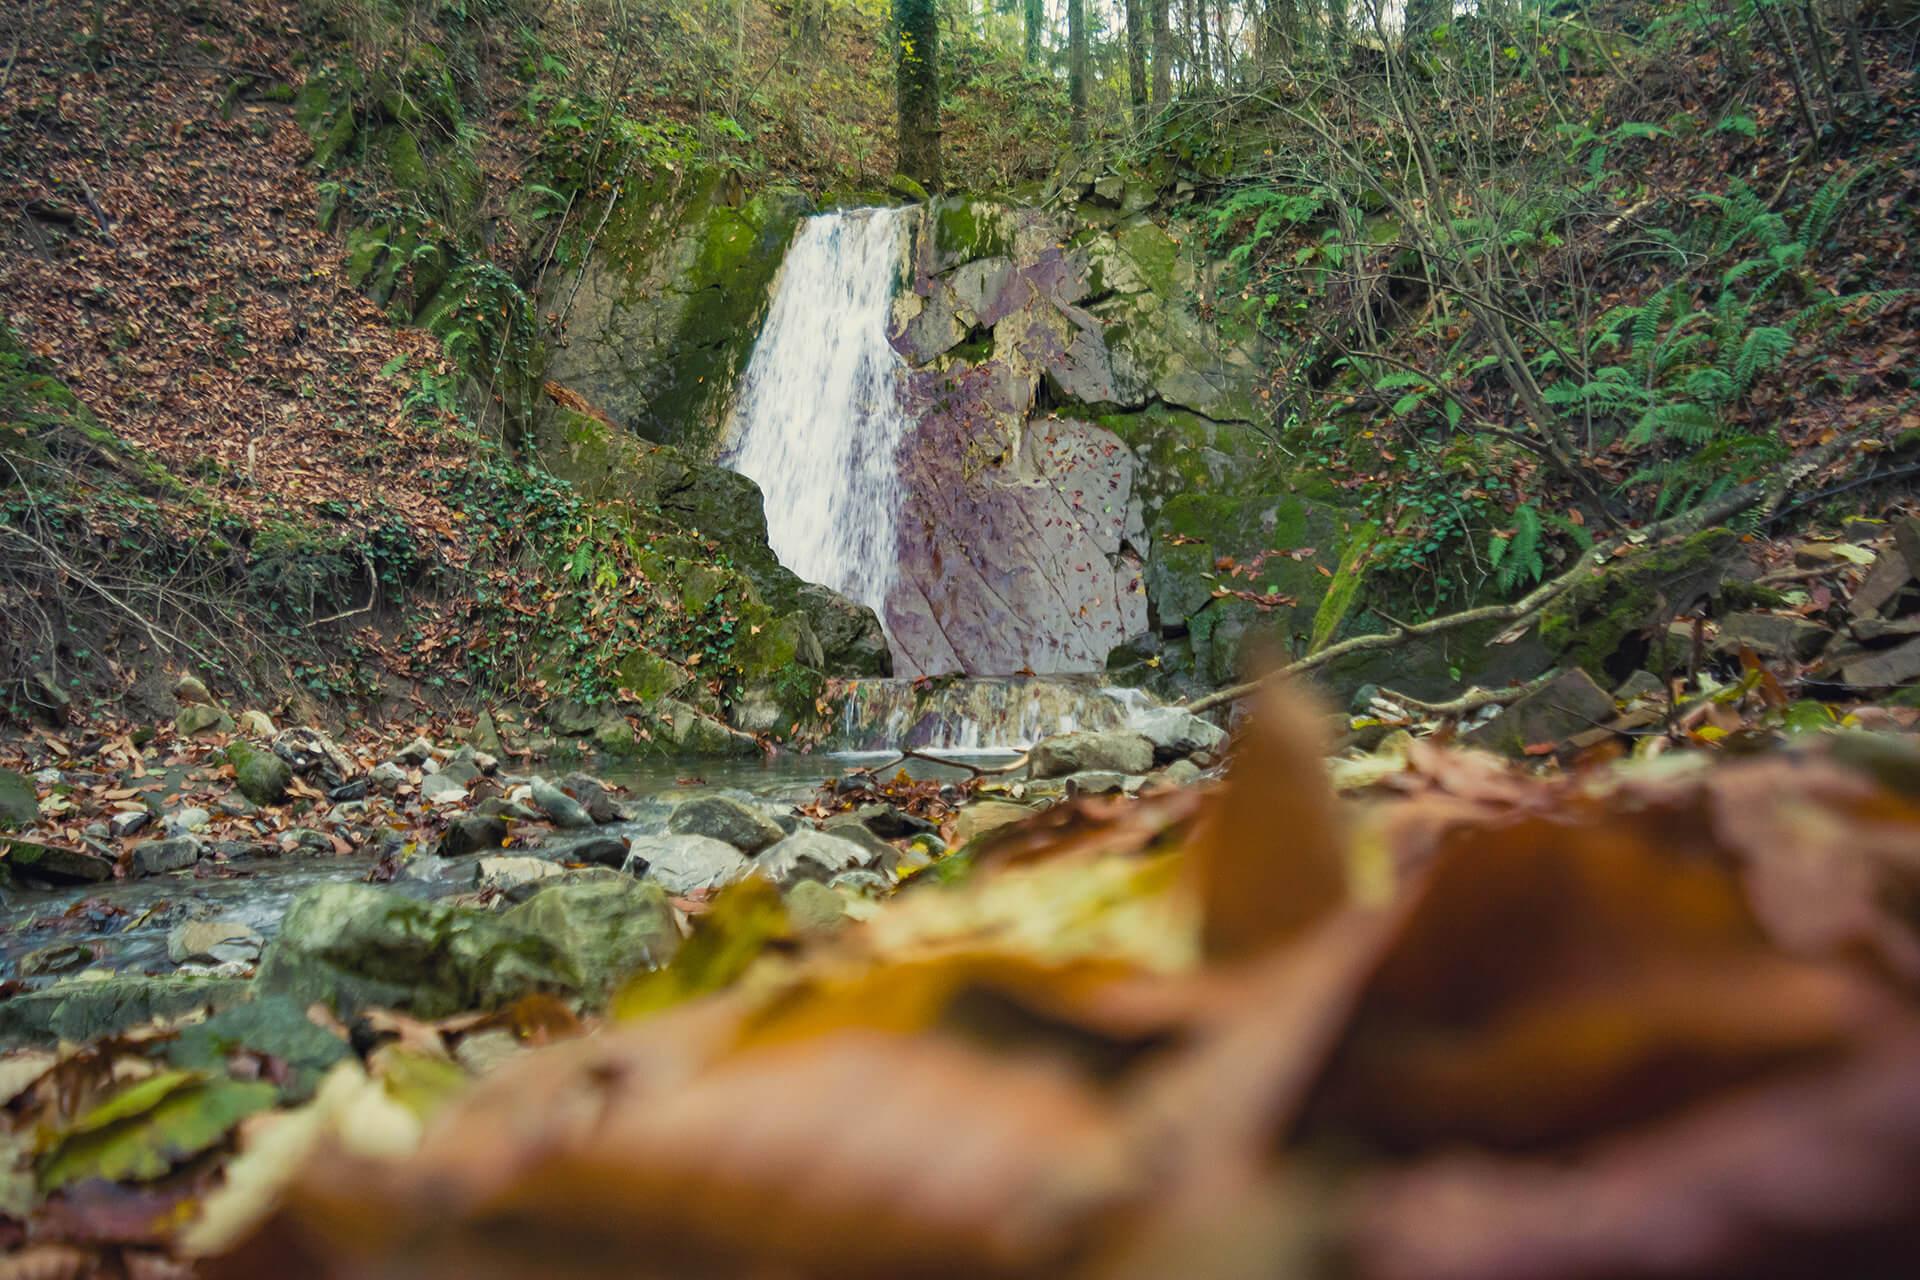 Четвертый водопад на реке Грязной